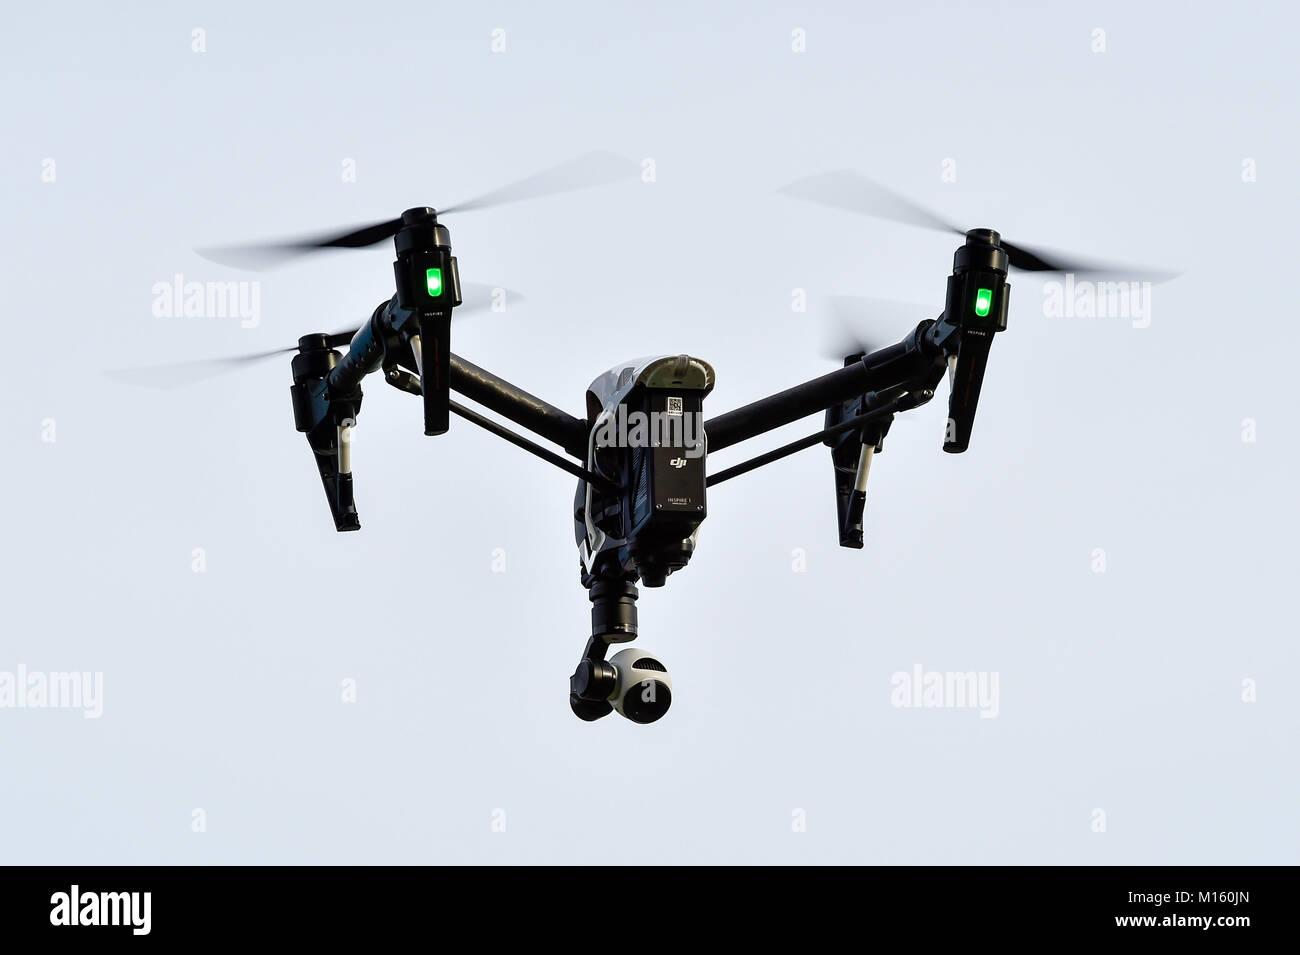 DJI Inspire 1 drone in flight - Stock Image